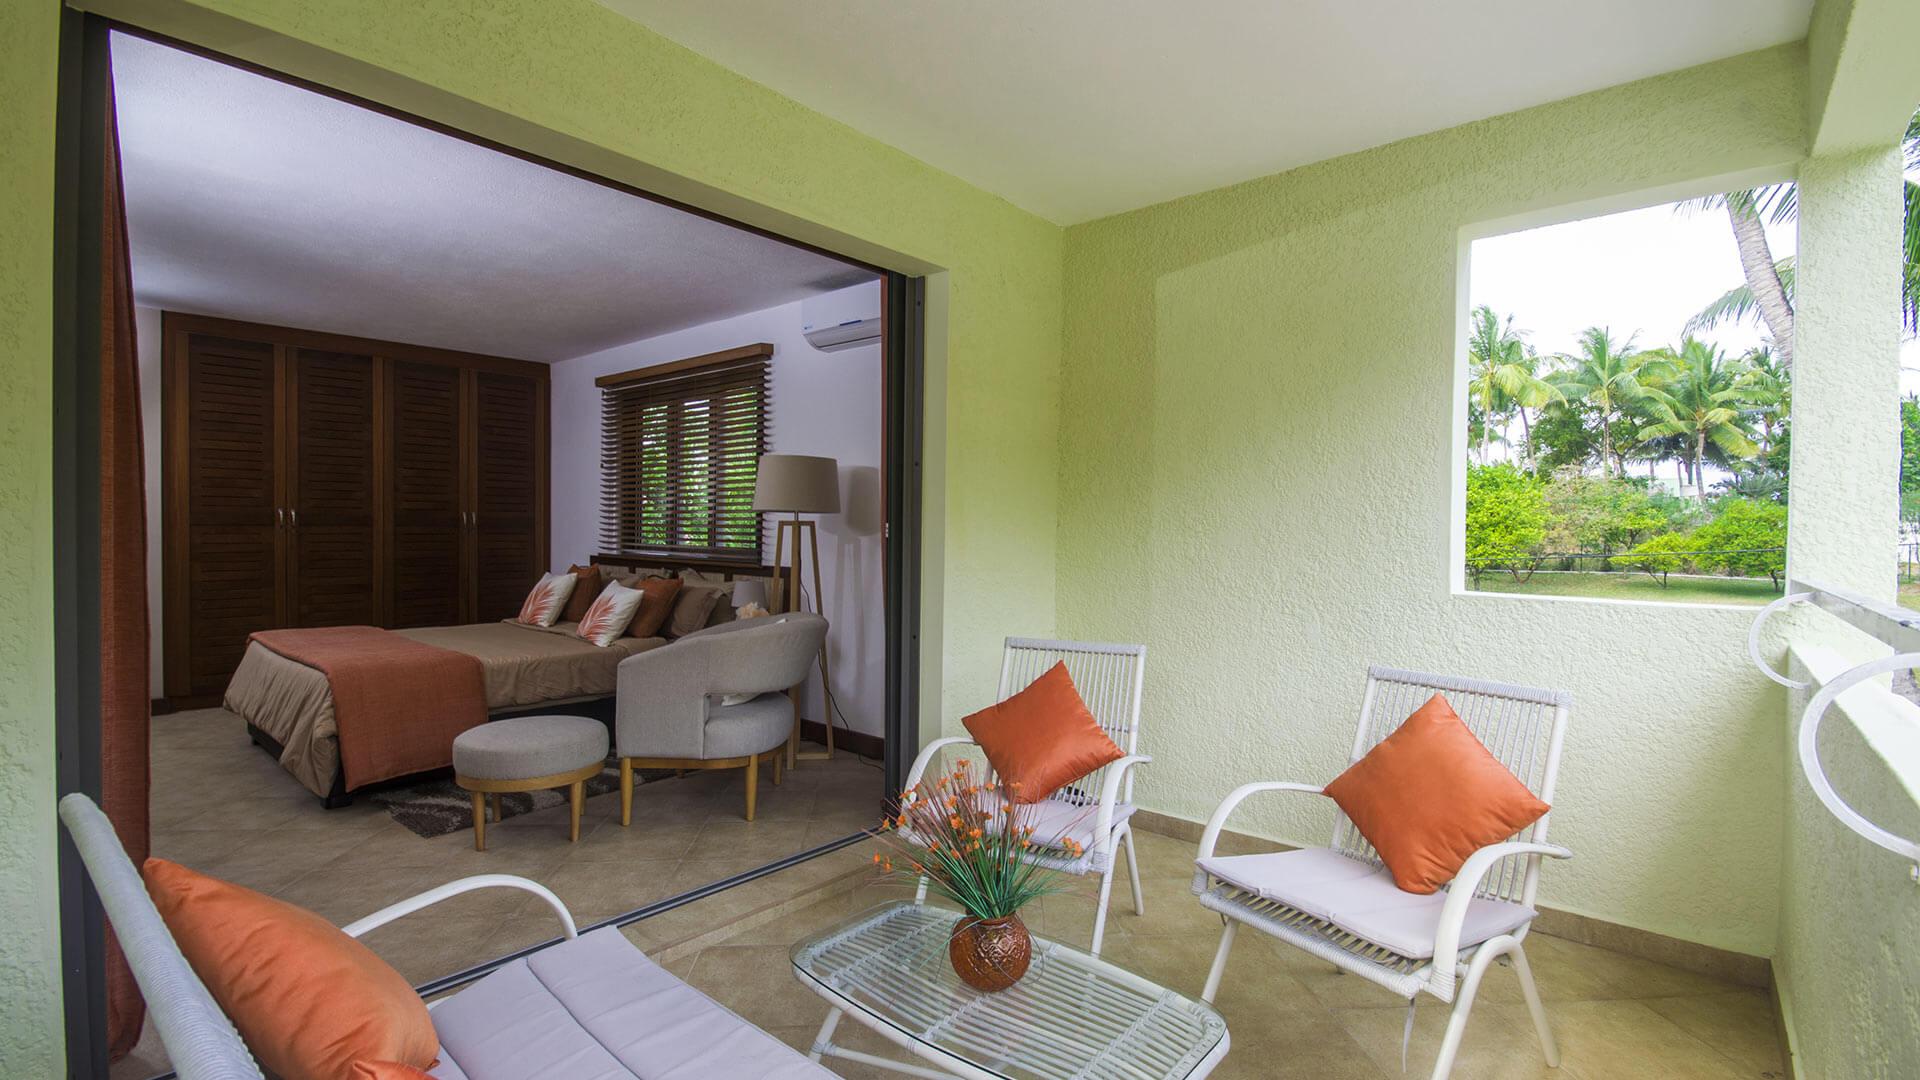 ile-maurice-est-villa-green-badamier-660